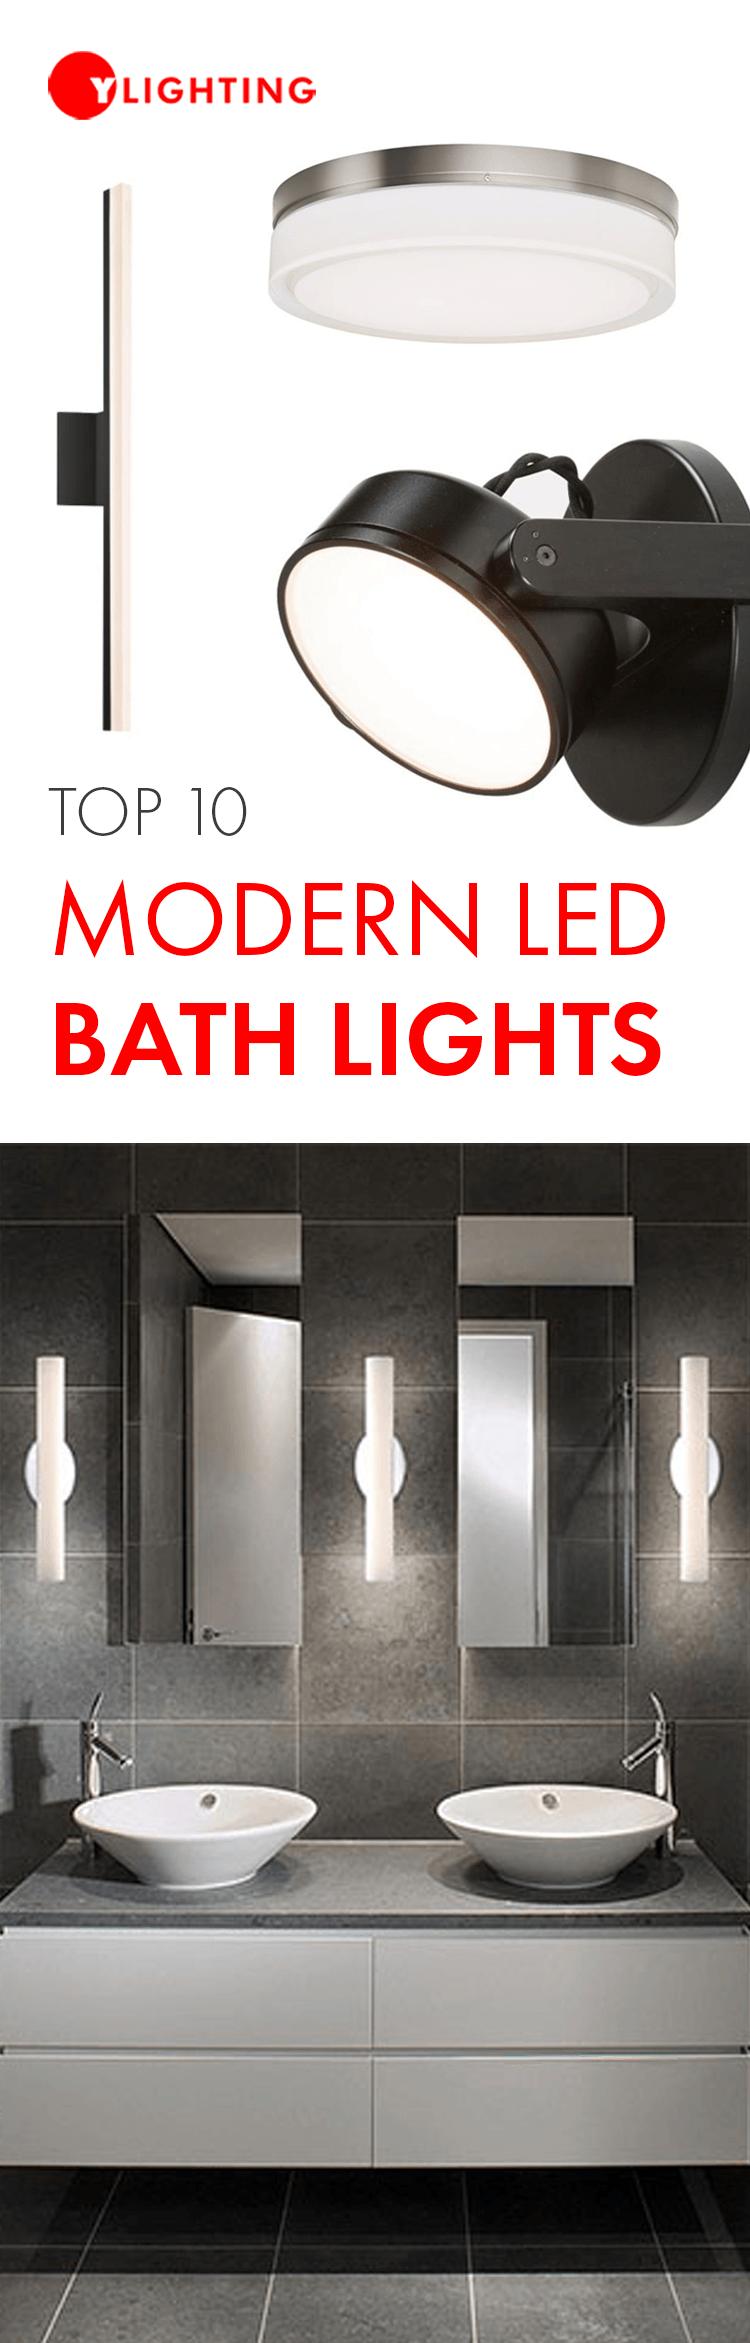 Top 10 Modern Led Bath Lights Modern Bathroom Lighting Bathroom Lighting Design Modern Bathroom Light Fixtures